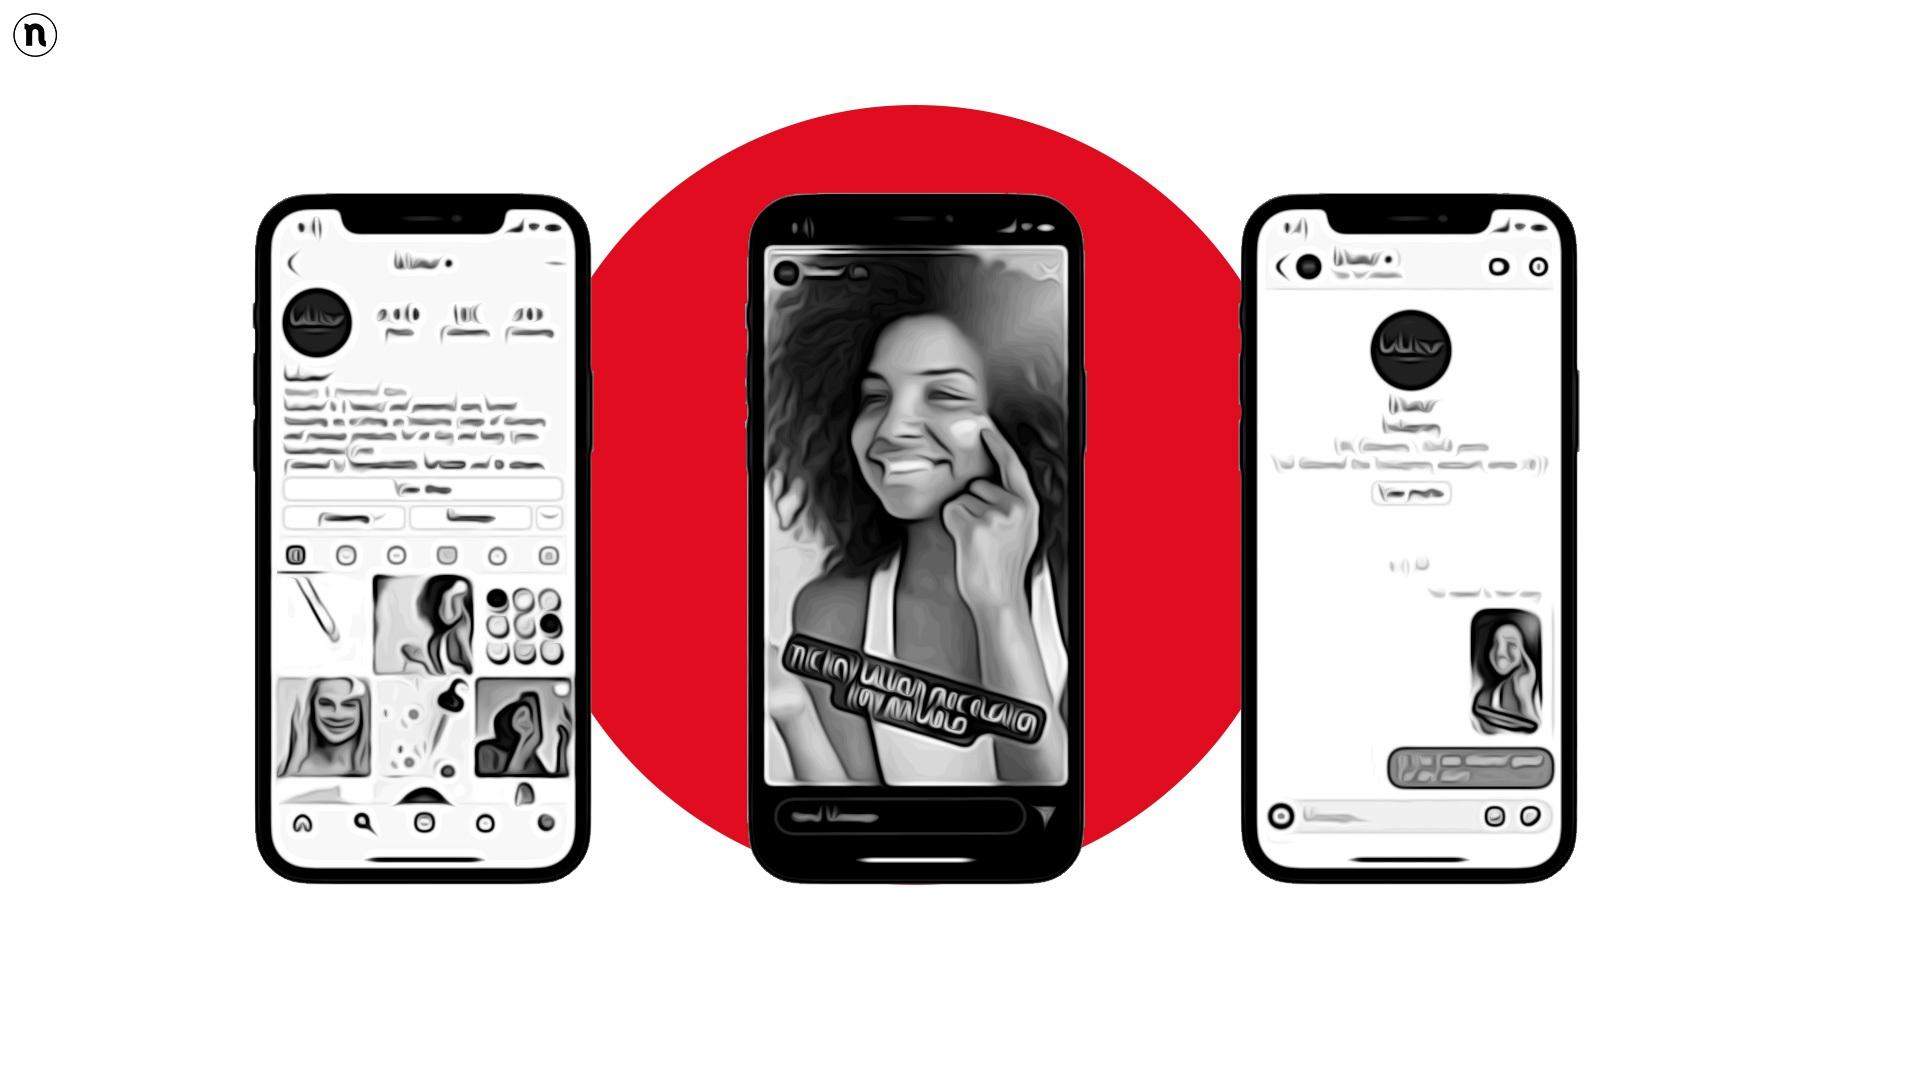 Facebook lancia l'API Messenger per gli utenti Instagram